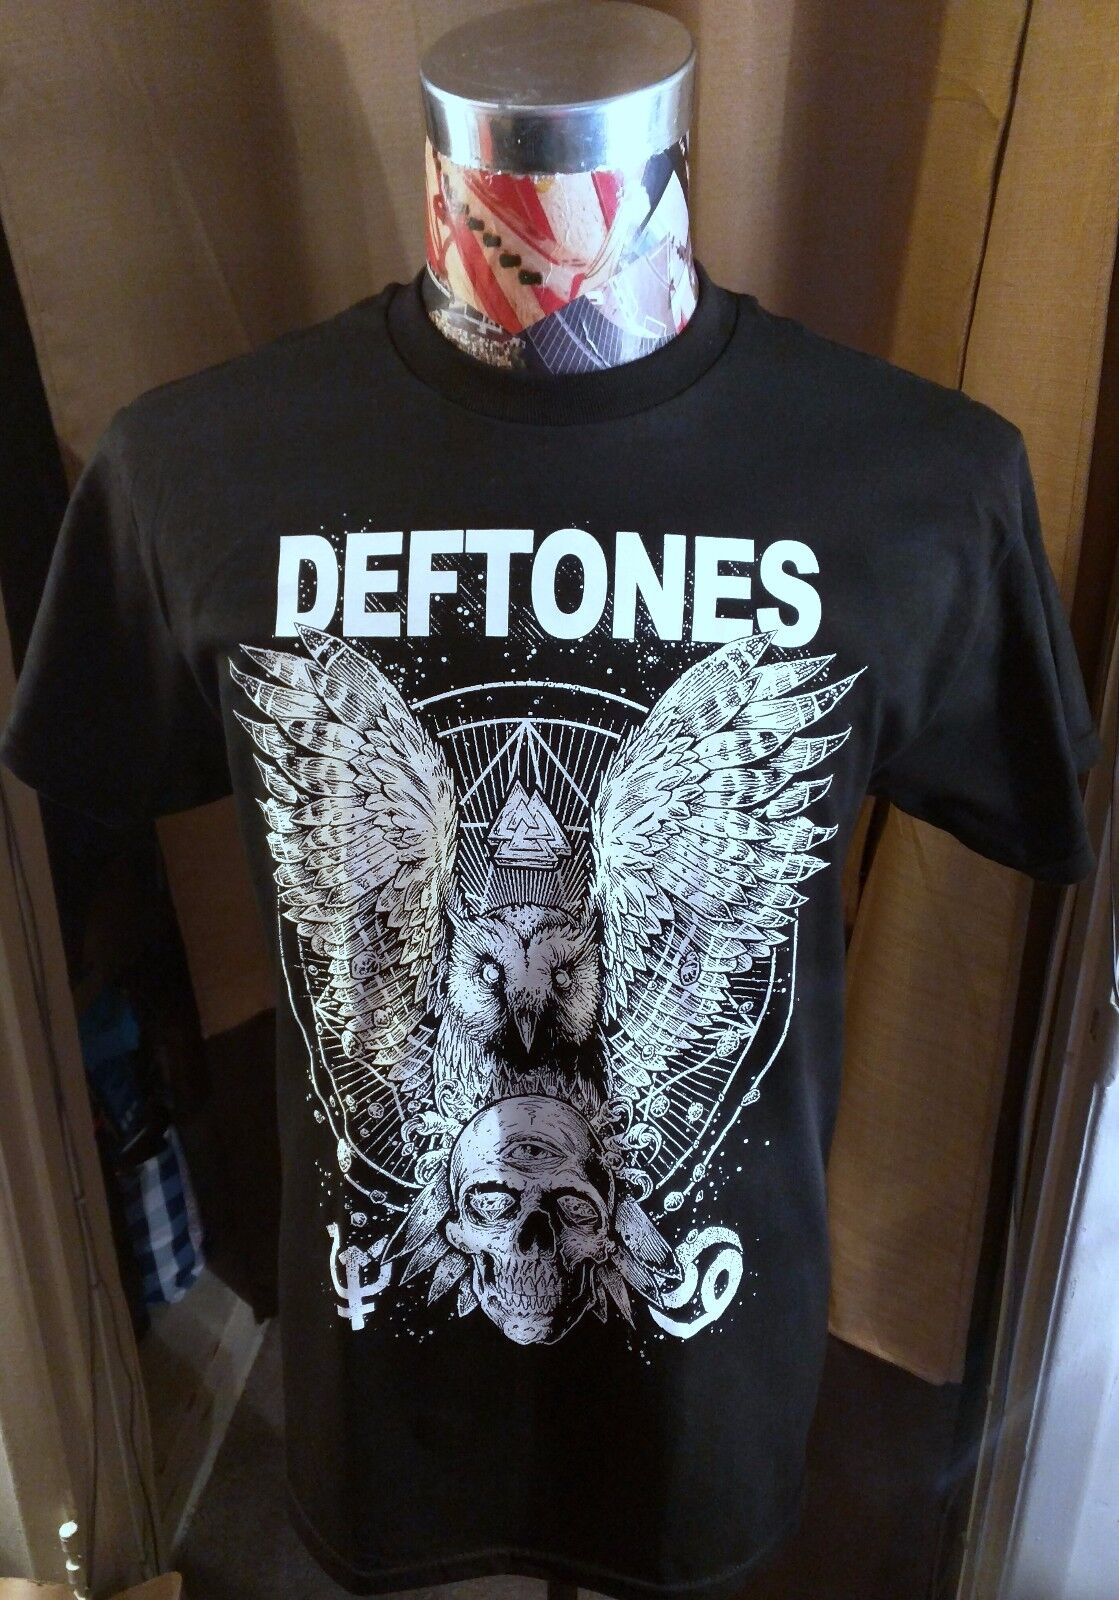 DEFTONES WHITE OWL & SKULL LOGO GOTHIC HEAVY METAL ON BLACK T SHIRT